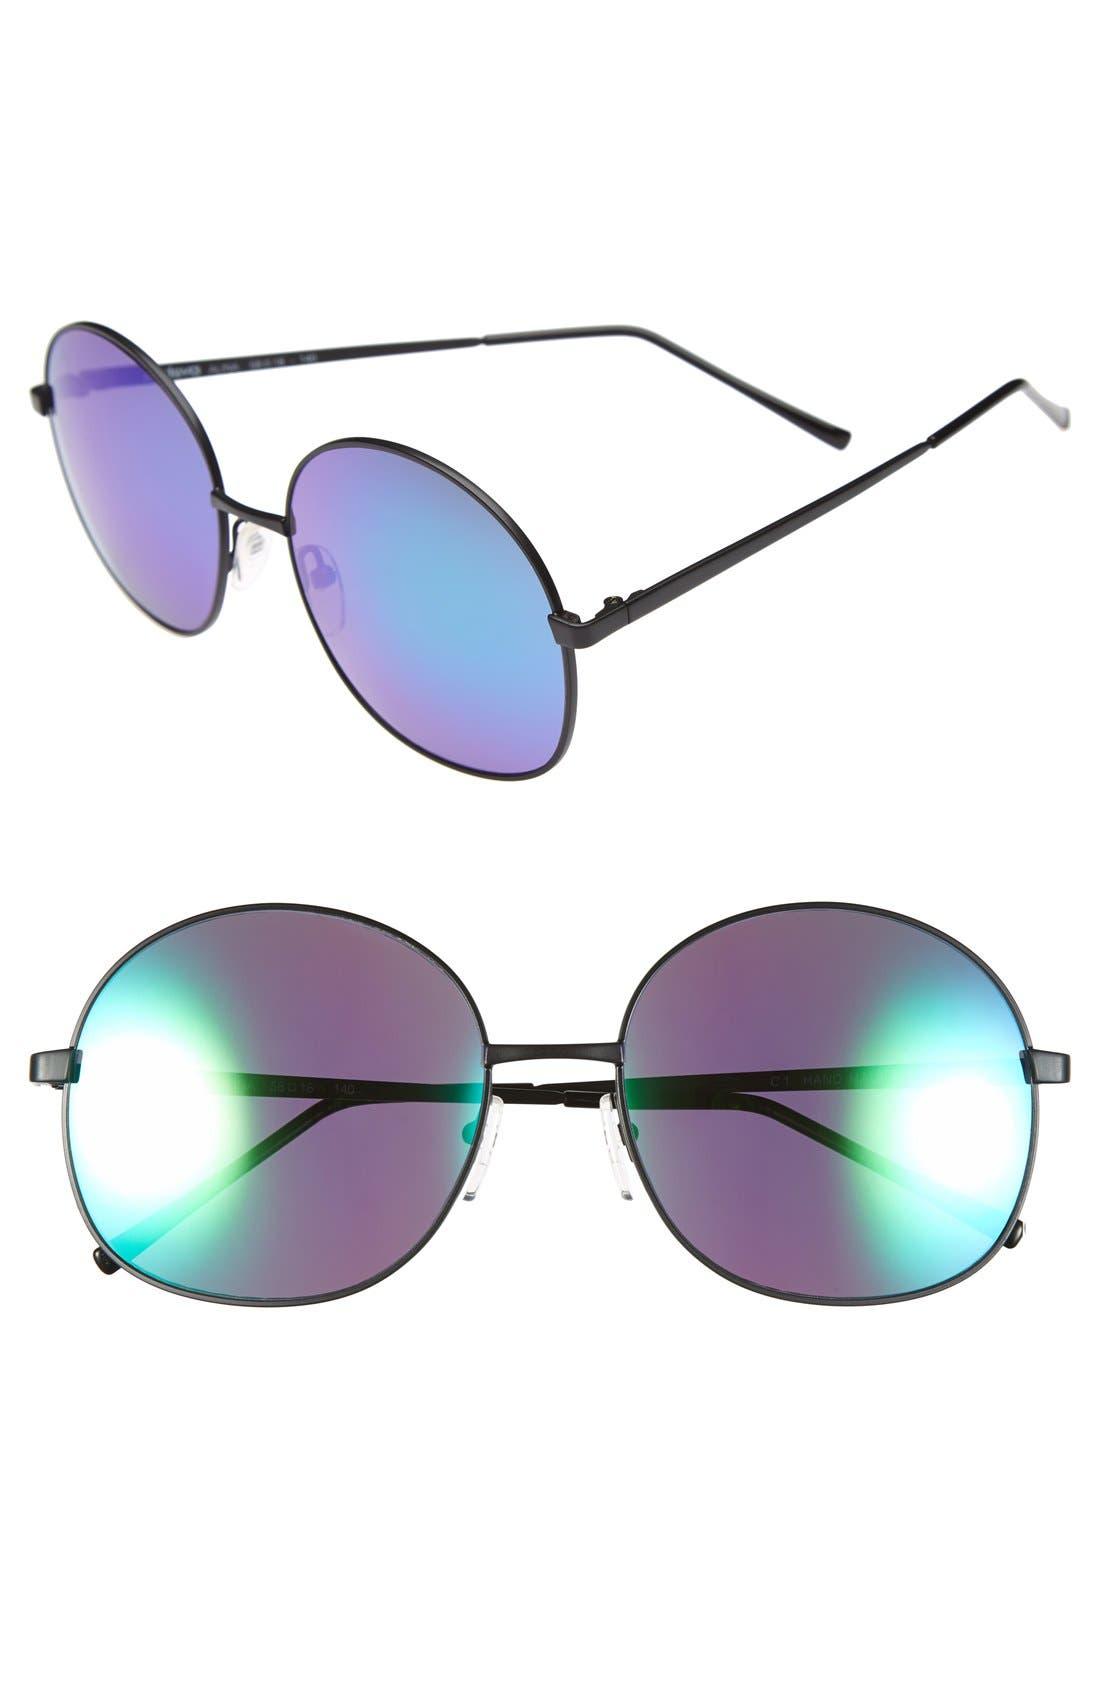 Main Image - Illesteva 'Alina' 58mm Sunglasses